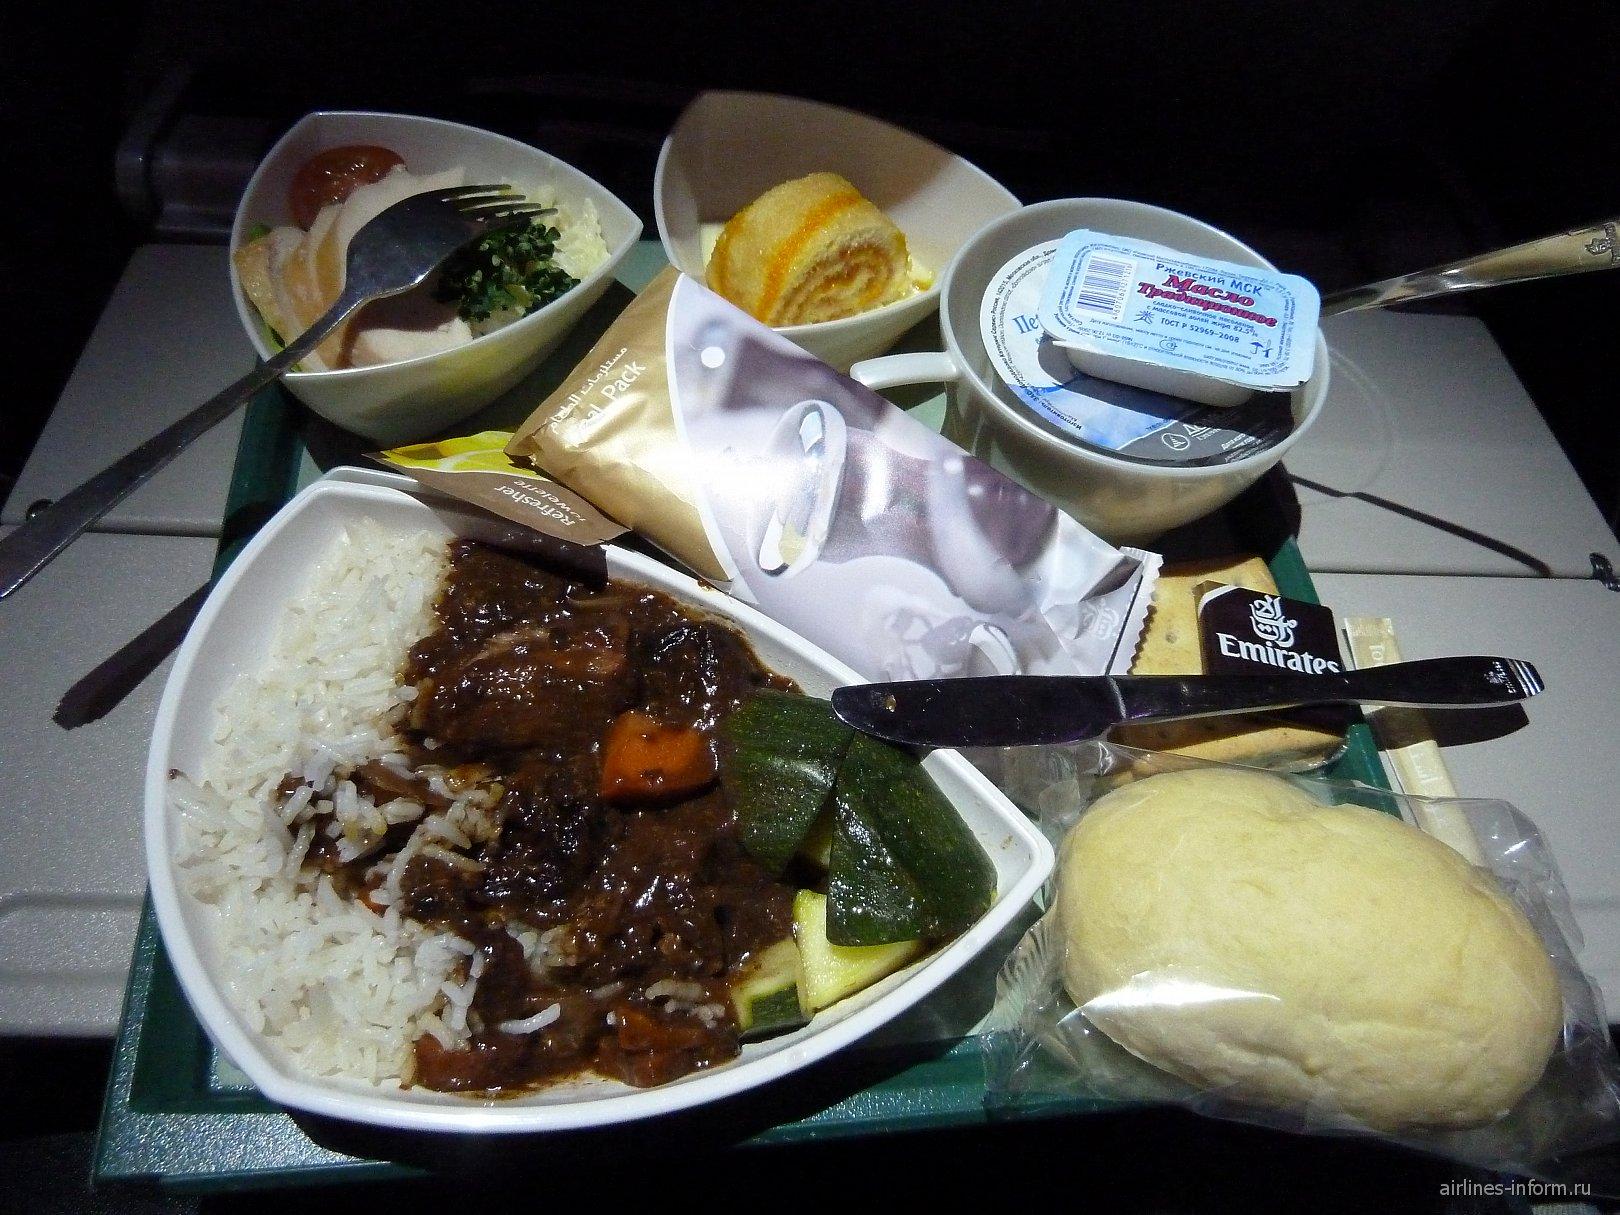 Питание на рейсе авиакомпании Emirates